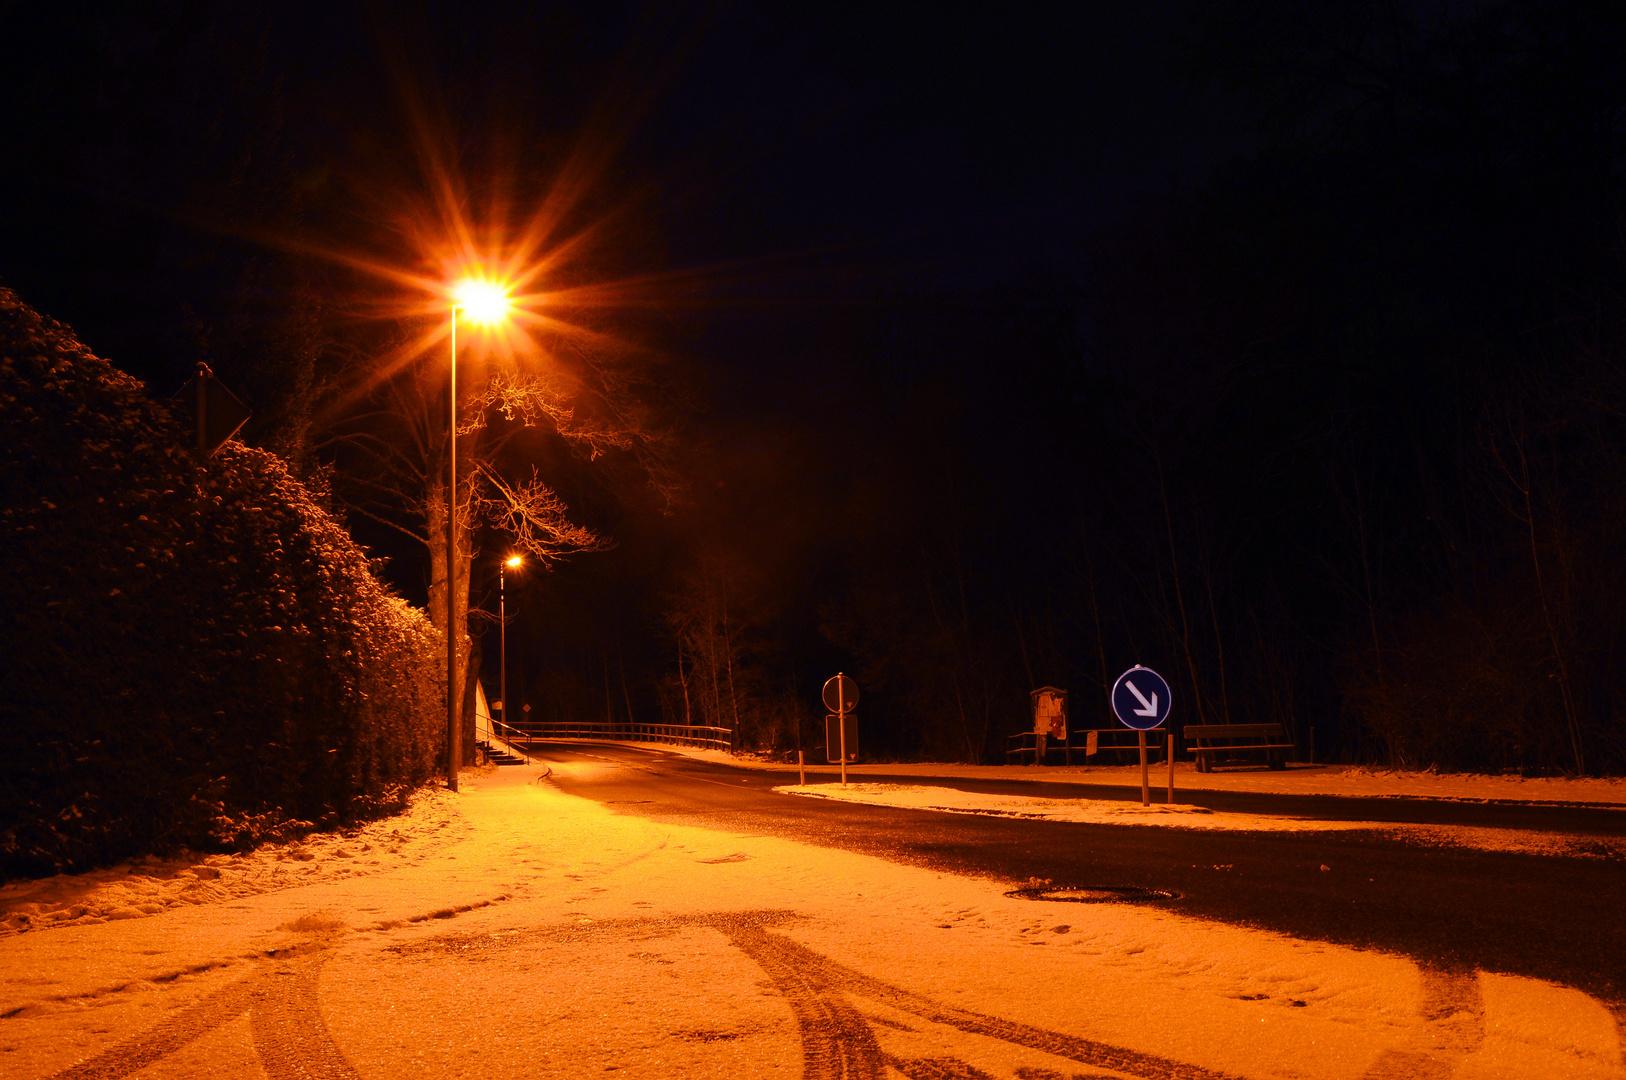 nightly silence